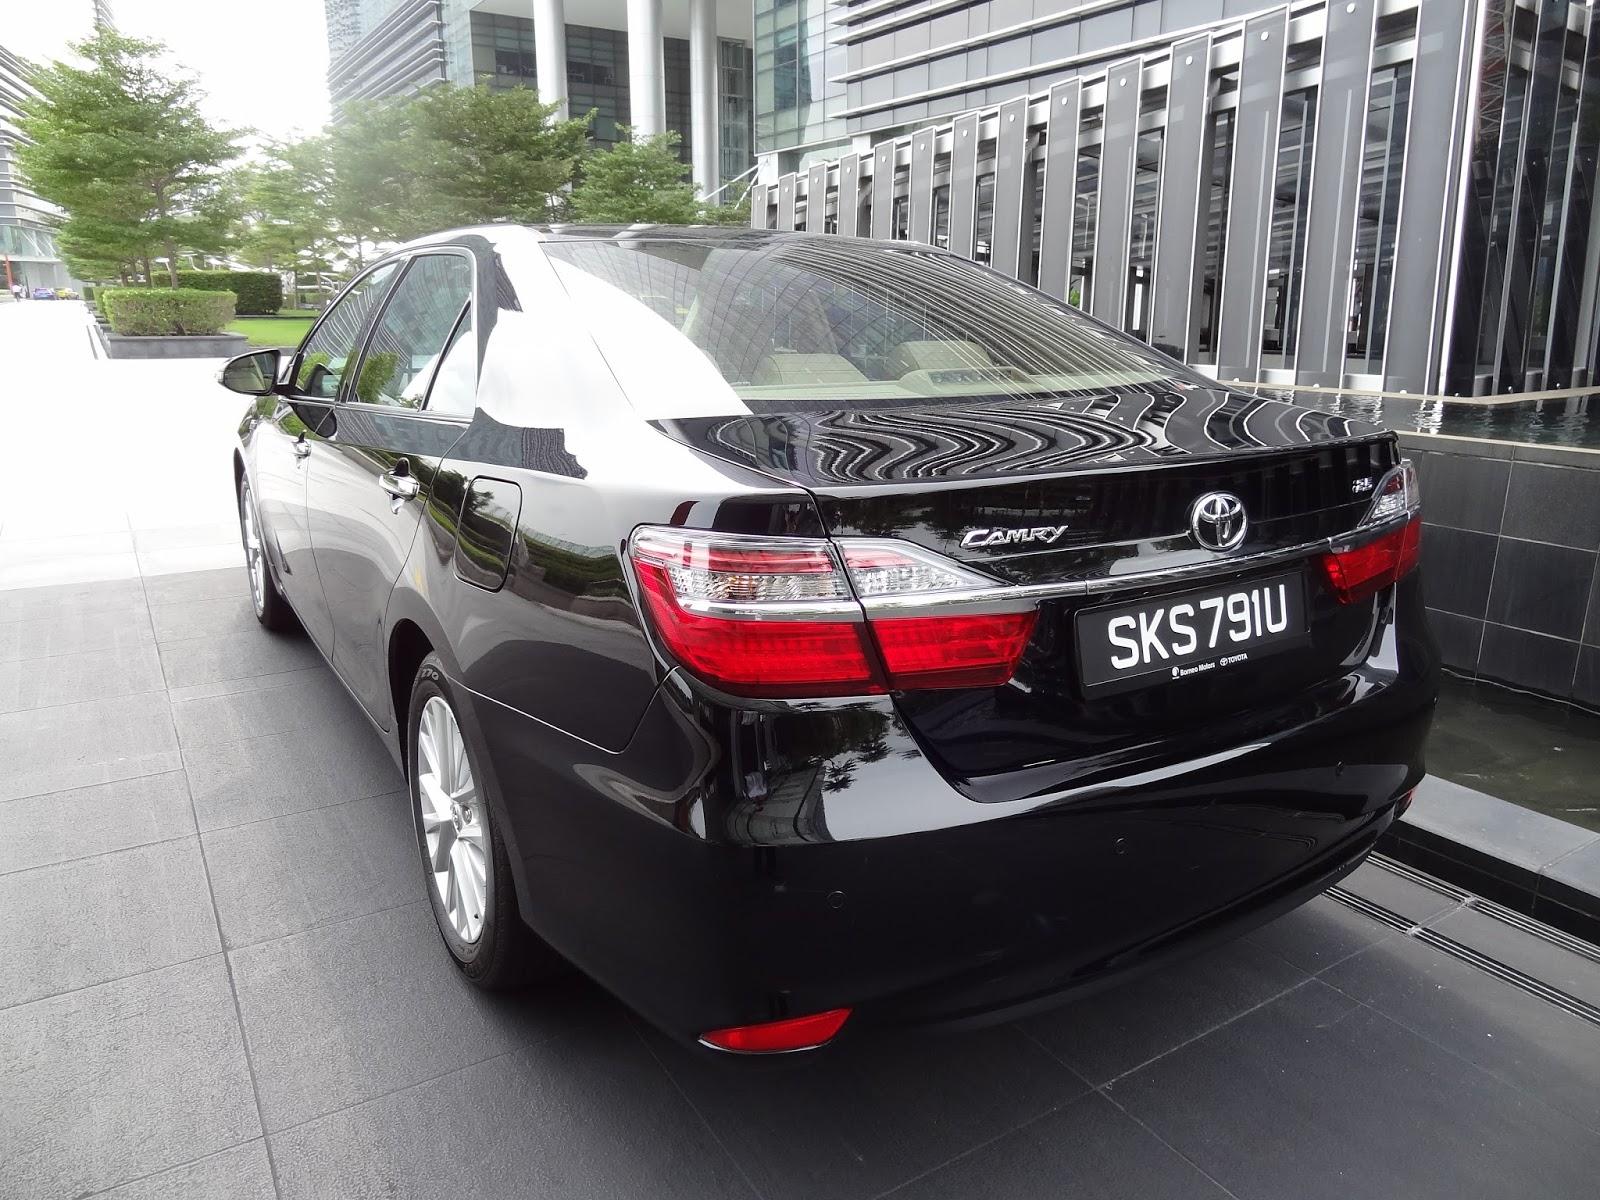 shaun owyeong 2015 toyota camry 2 5 a class leading executive sedan. Black Bedroom Furniture Sets. Home Design Ideas